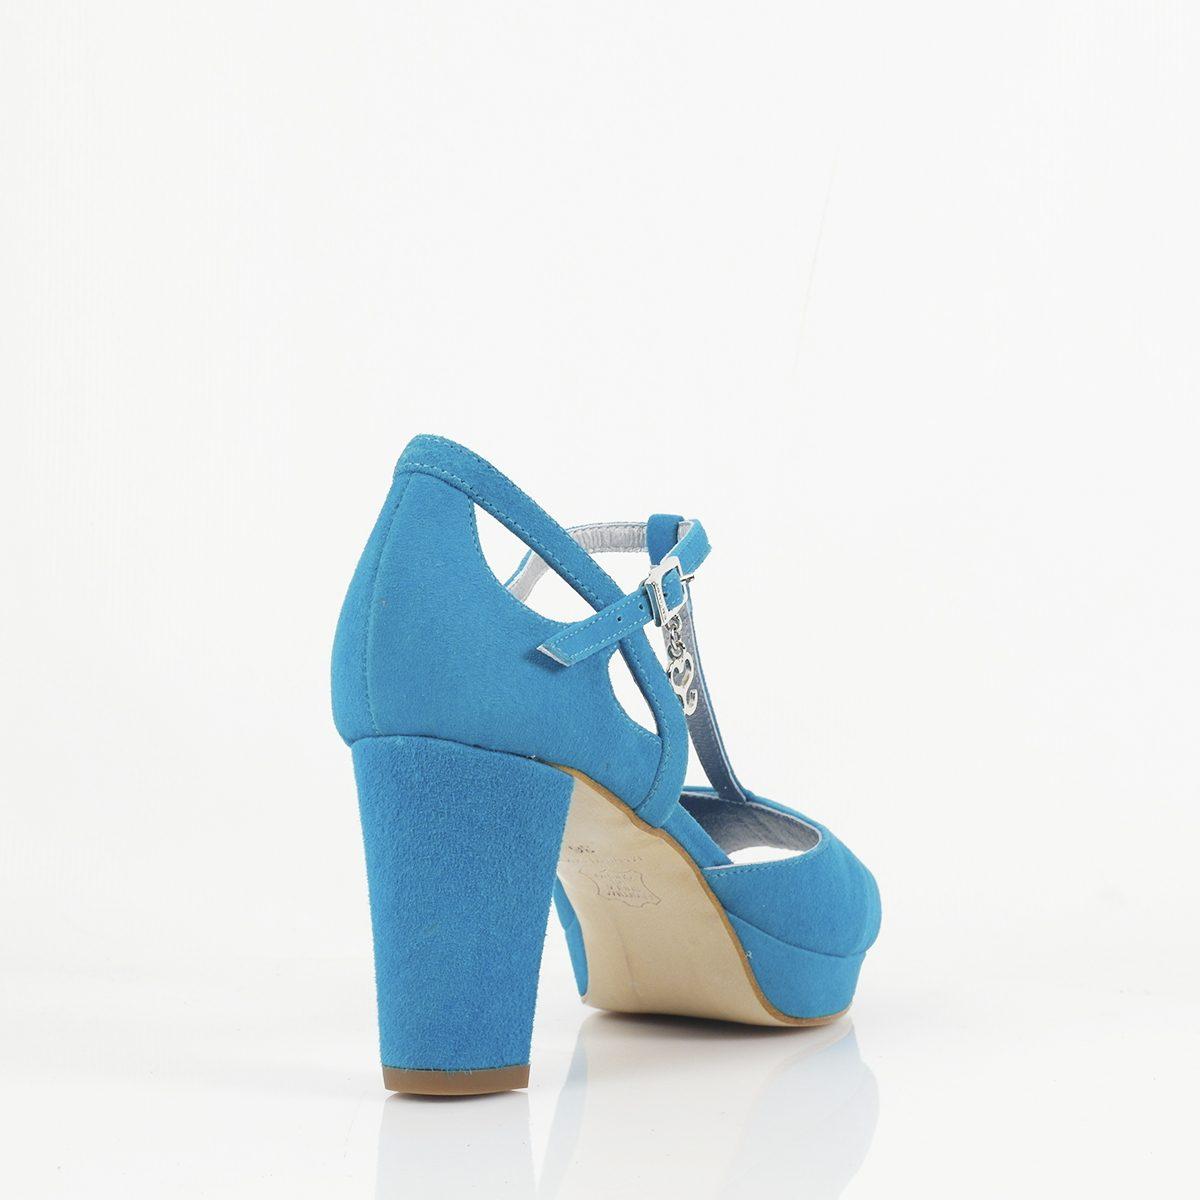 SANDALIA MOD.2332 (8cm)- zapatos personalizados fiesta